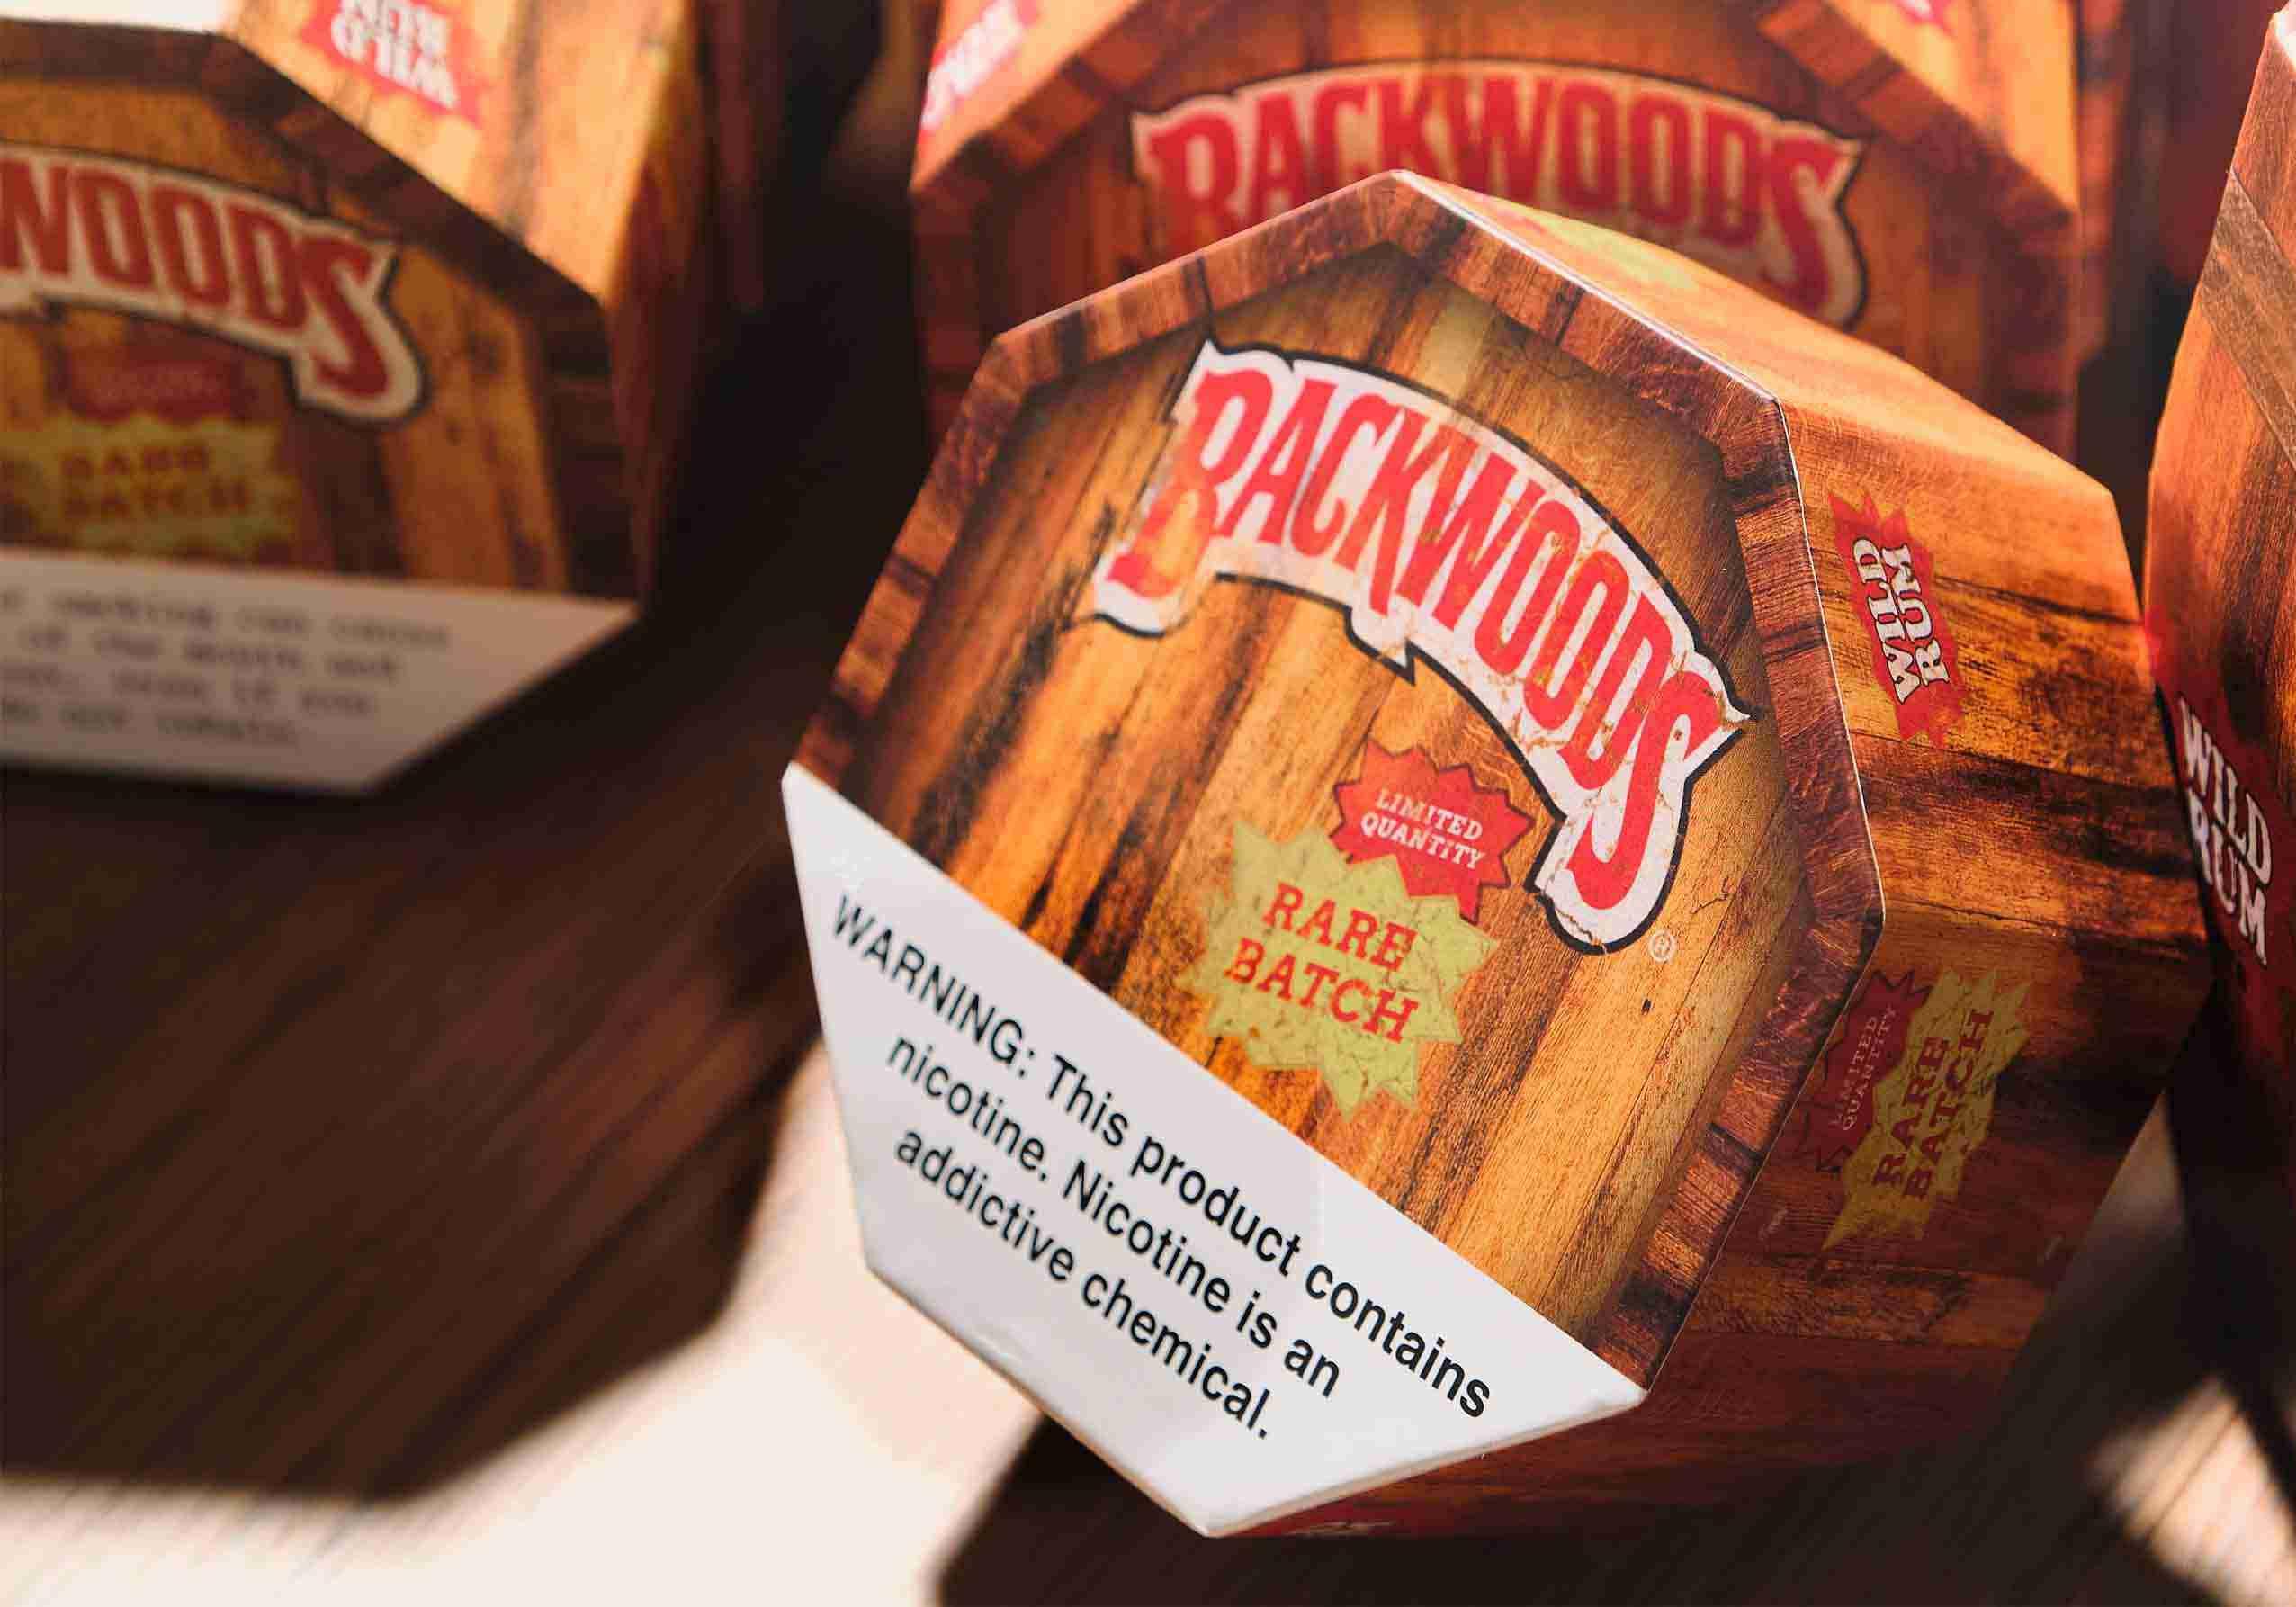 Backwoods Wild Rum Cigar Barrel